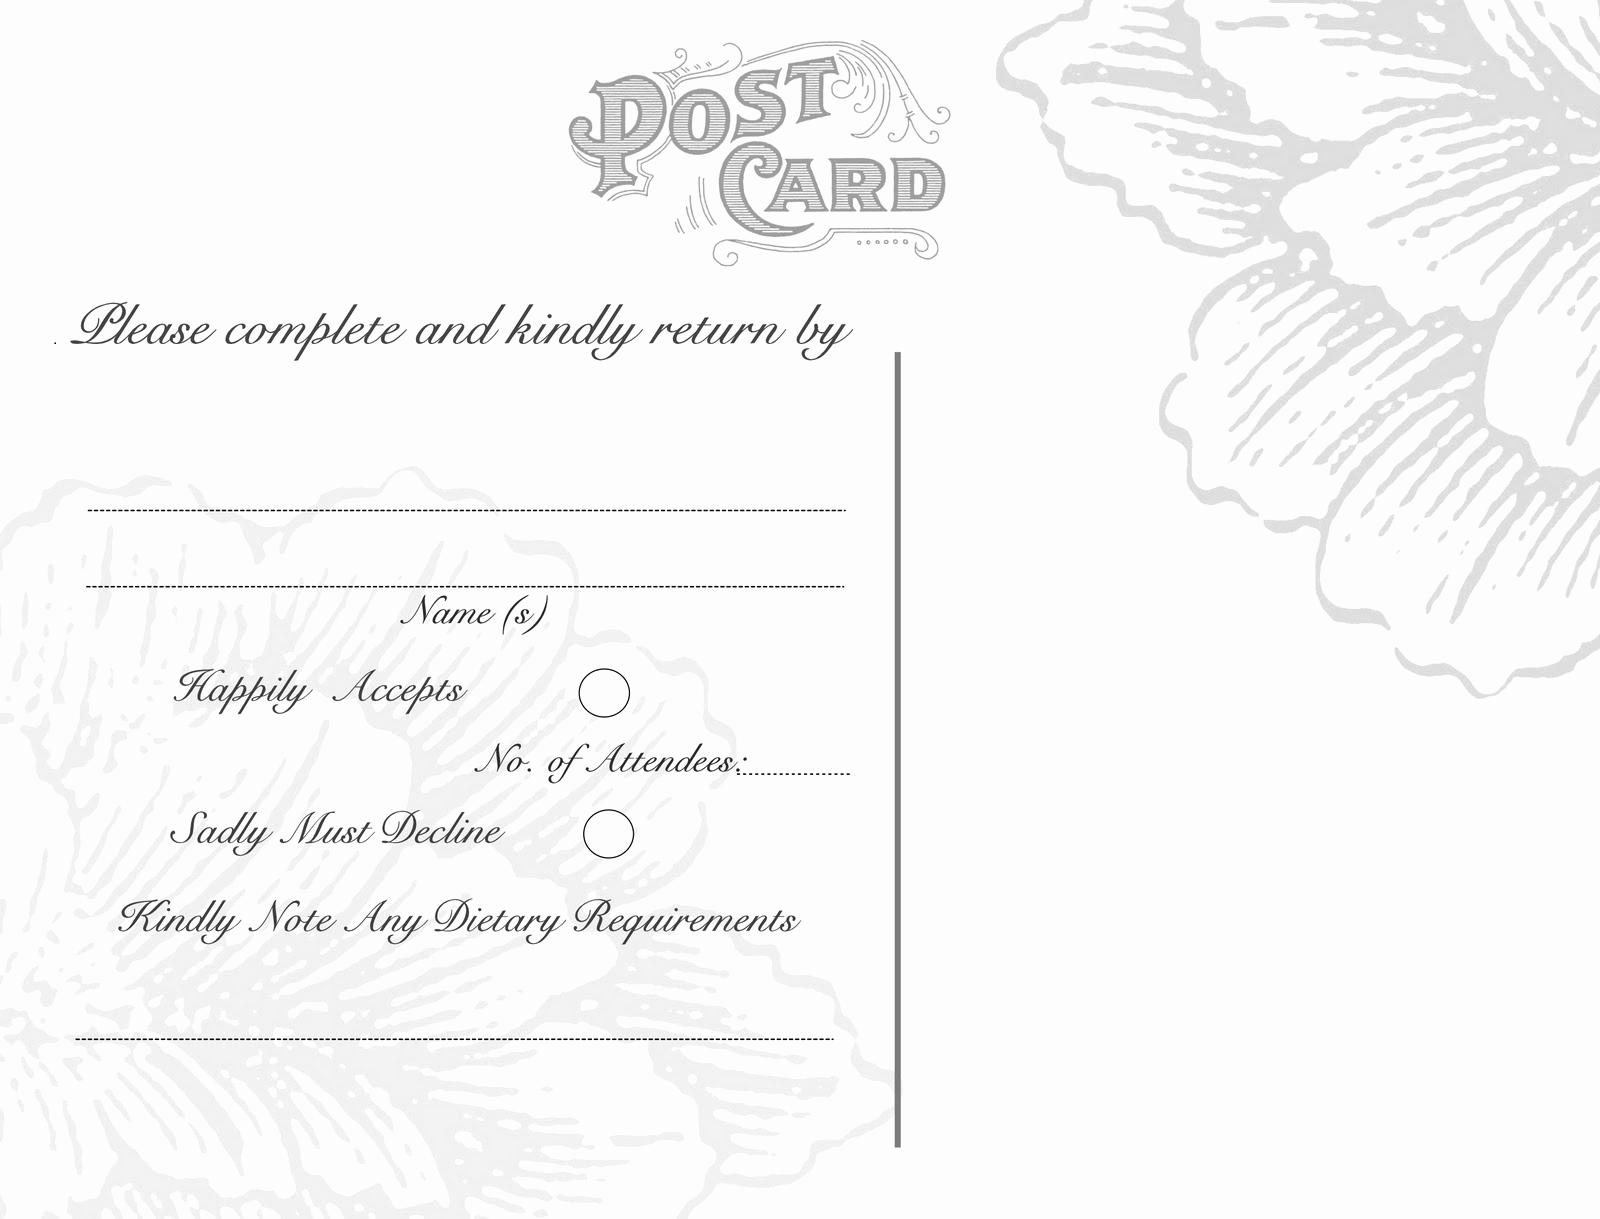 Free Printable Postcard Templates Unique Omg My Diy Wedding Free Vintage Postcard Back & Peony